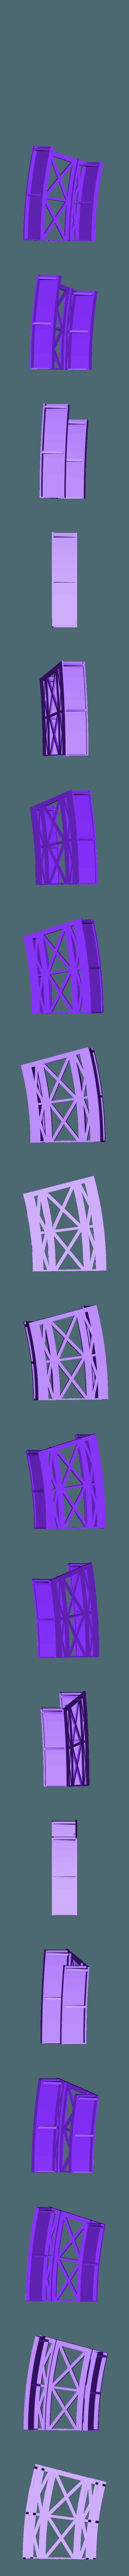 RH_Section_360mm_15R_Bridge_for_Marklin_24130.stl Download free STL file HO Scale Curved Bridge for Marklin Track • 3D printable model, kabrumble